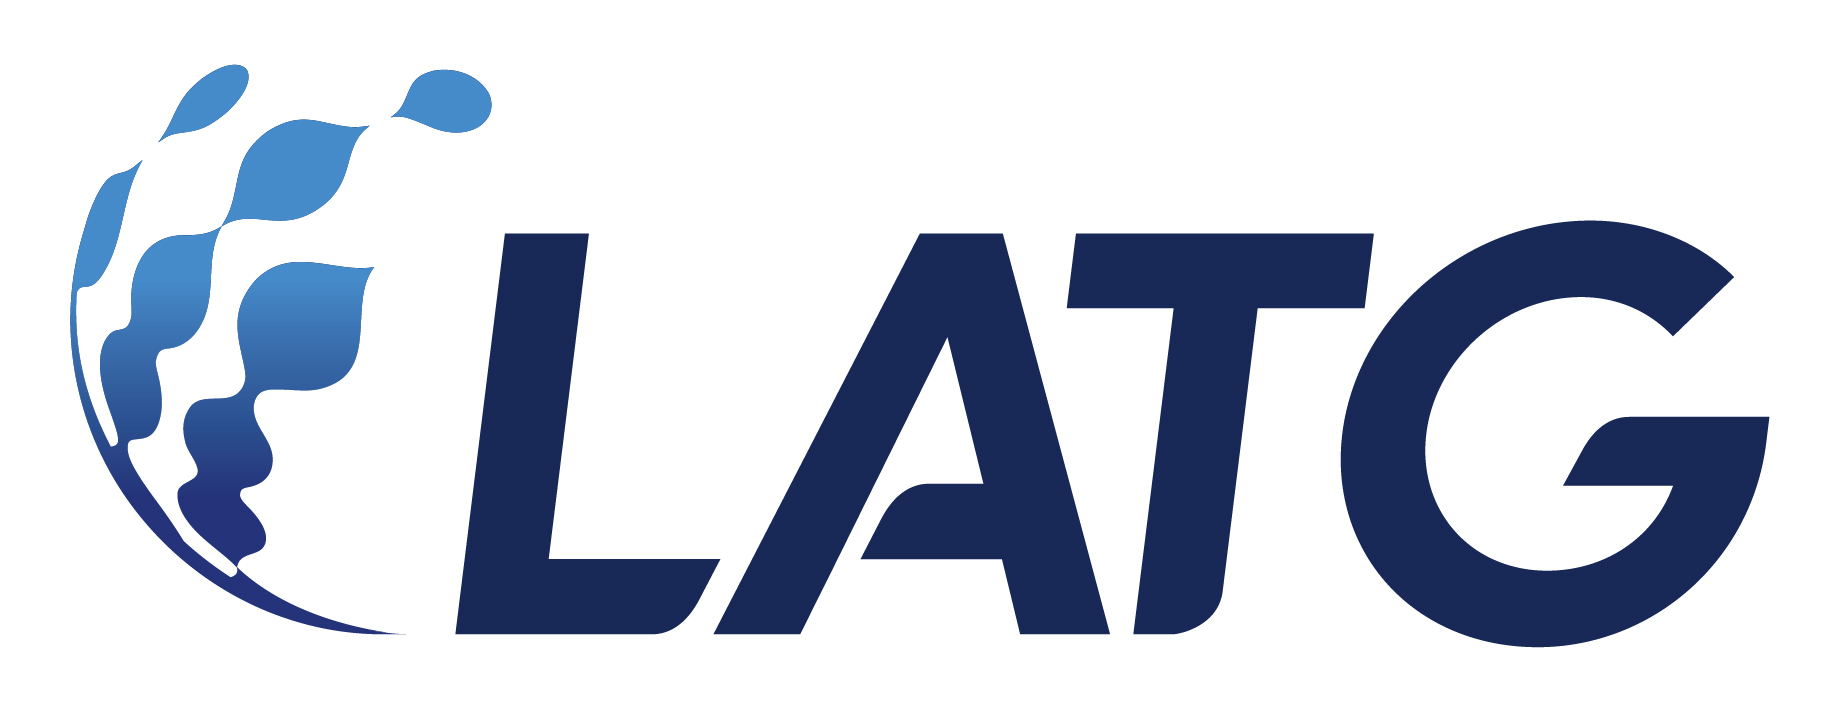 Louisiana Technology Group logo